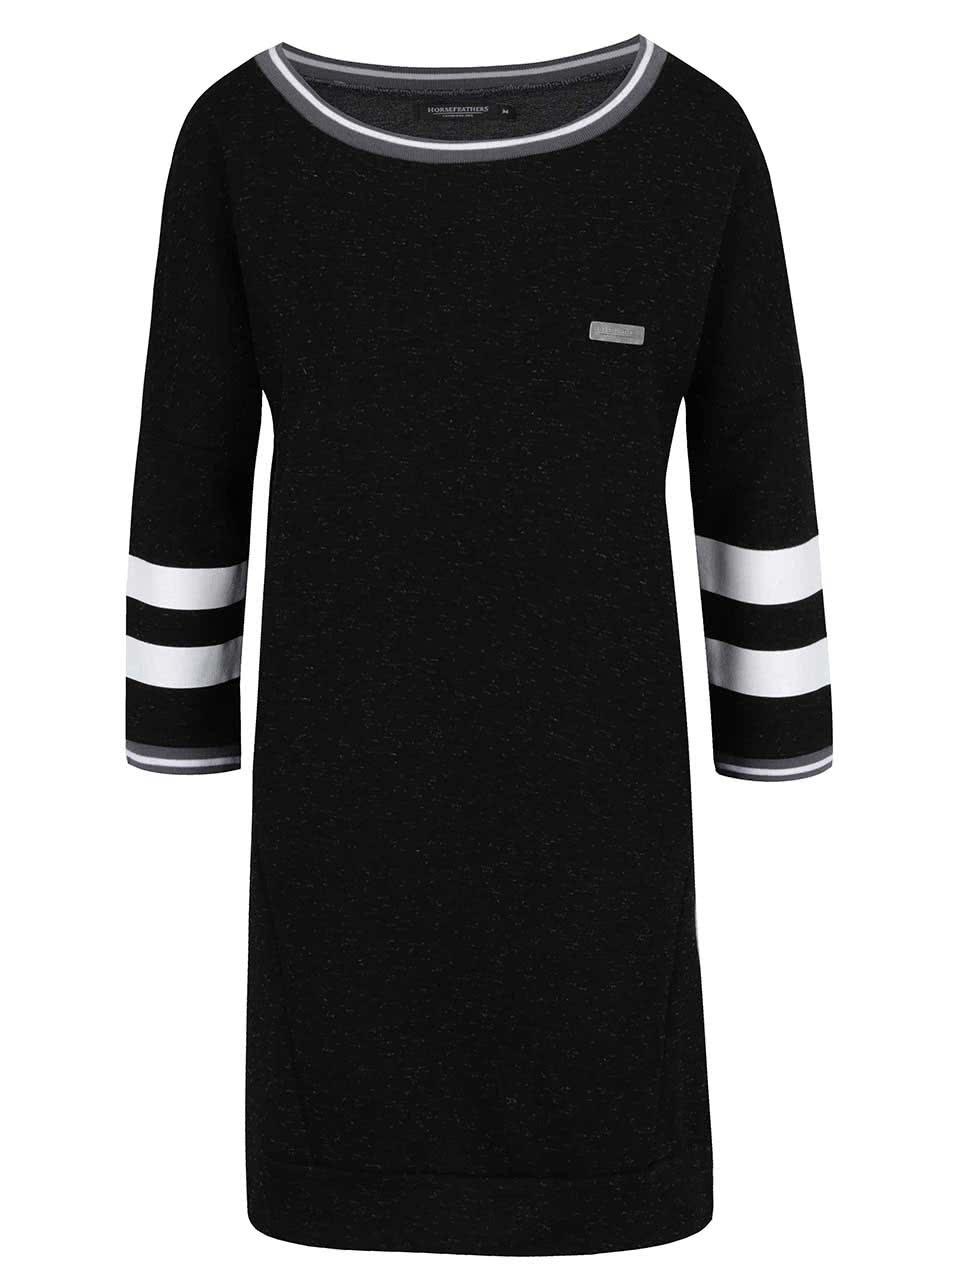 Čierne mikinové šaty Horsefeathers Doris ... f330211f042